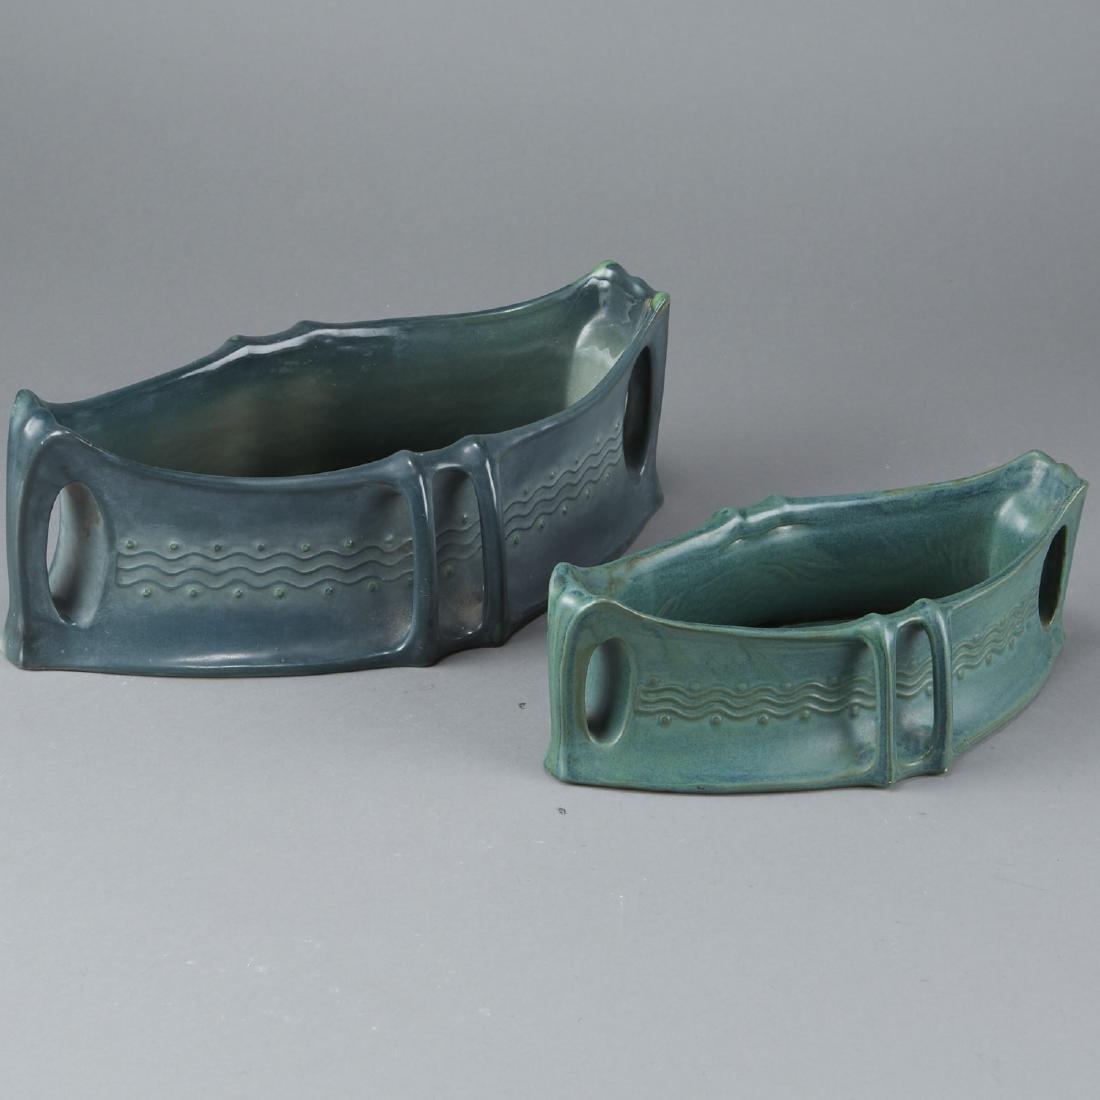 Pair of Amphora Arts and Crafts Basin - 3